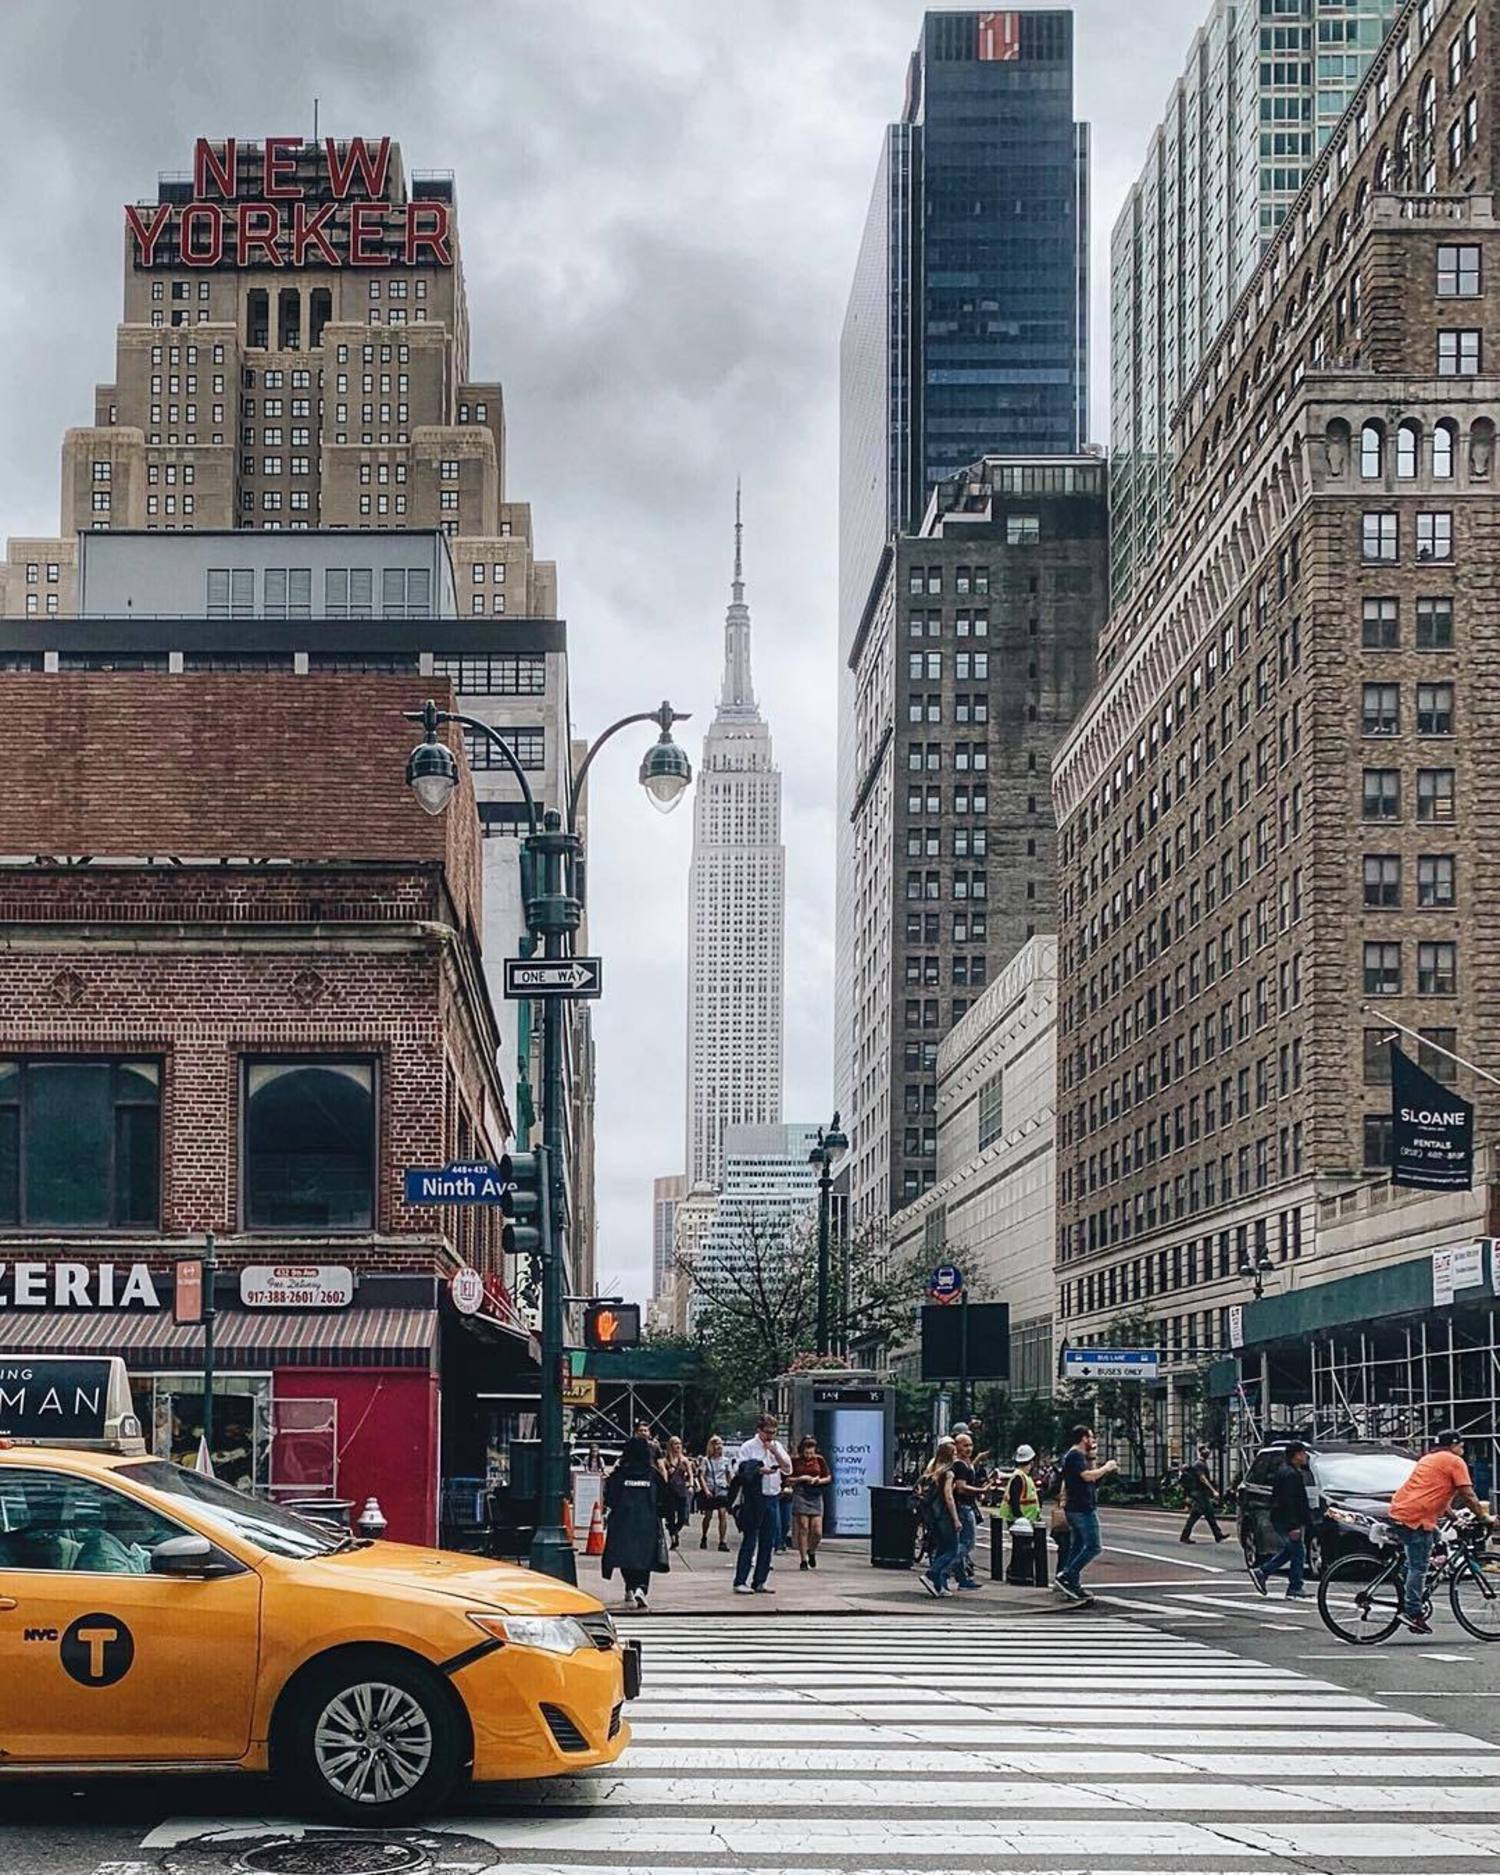 Hell's Kitchen, Manhattan. Photo via @iwyndt #viewingnyc #newyork #newyorkcity #nyc #empirestatebuilding